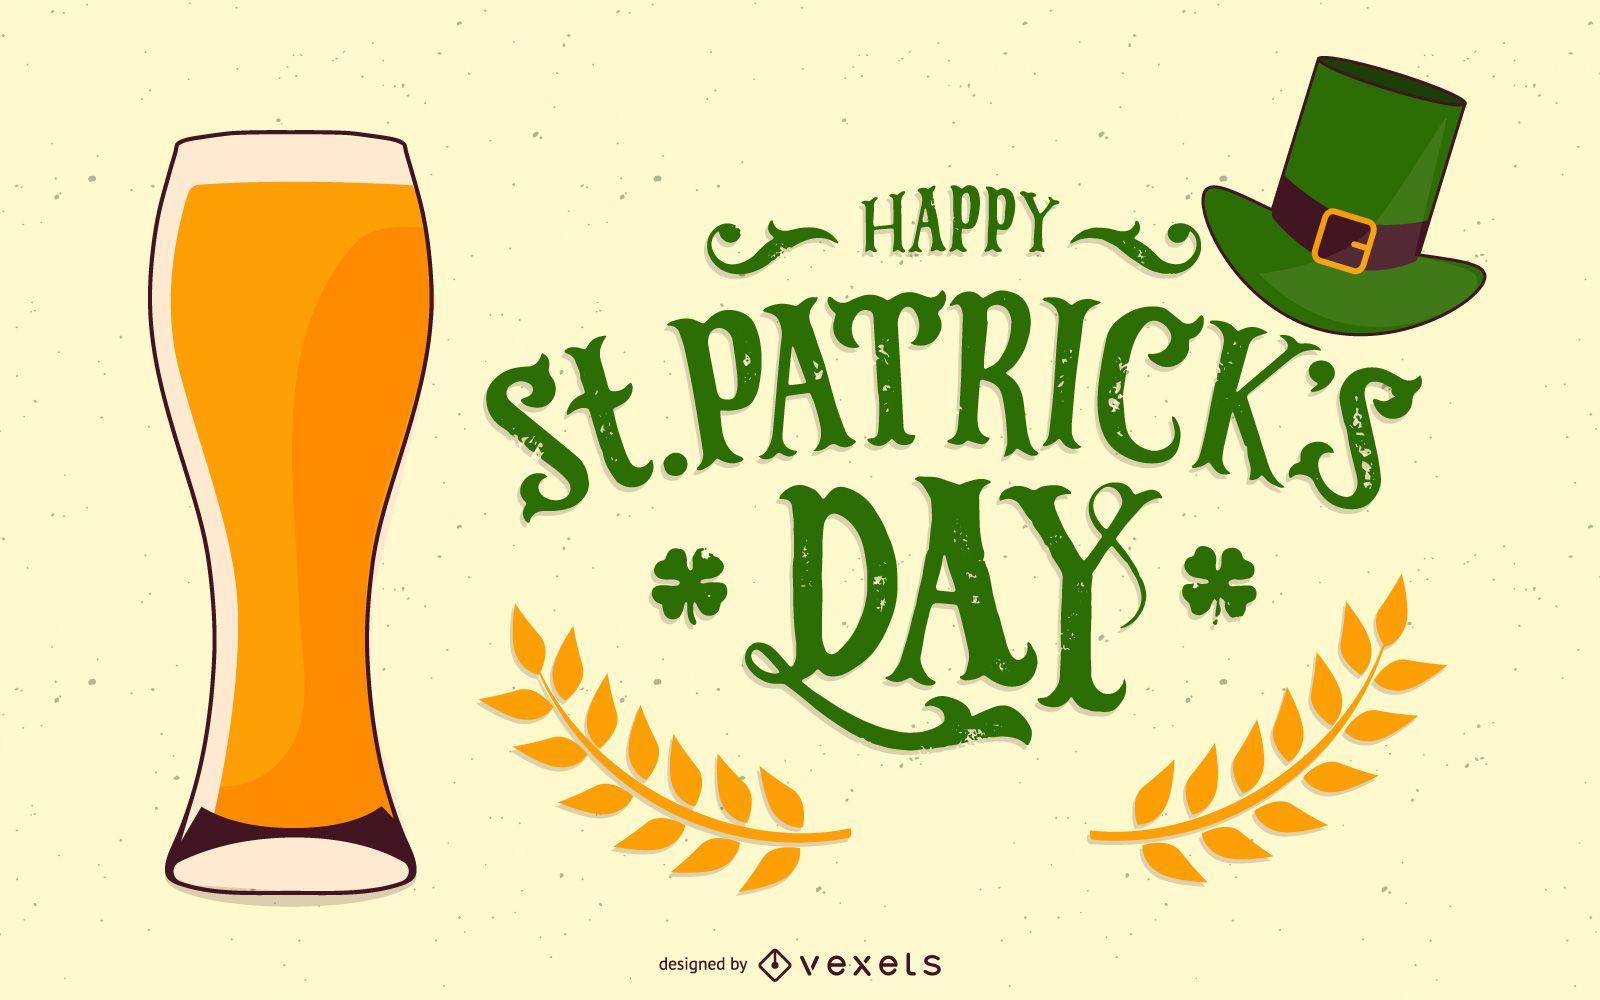 St Patrick's Day lettering illustration